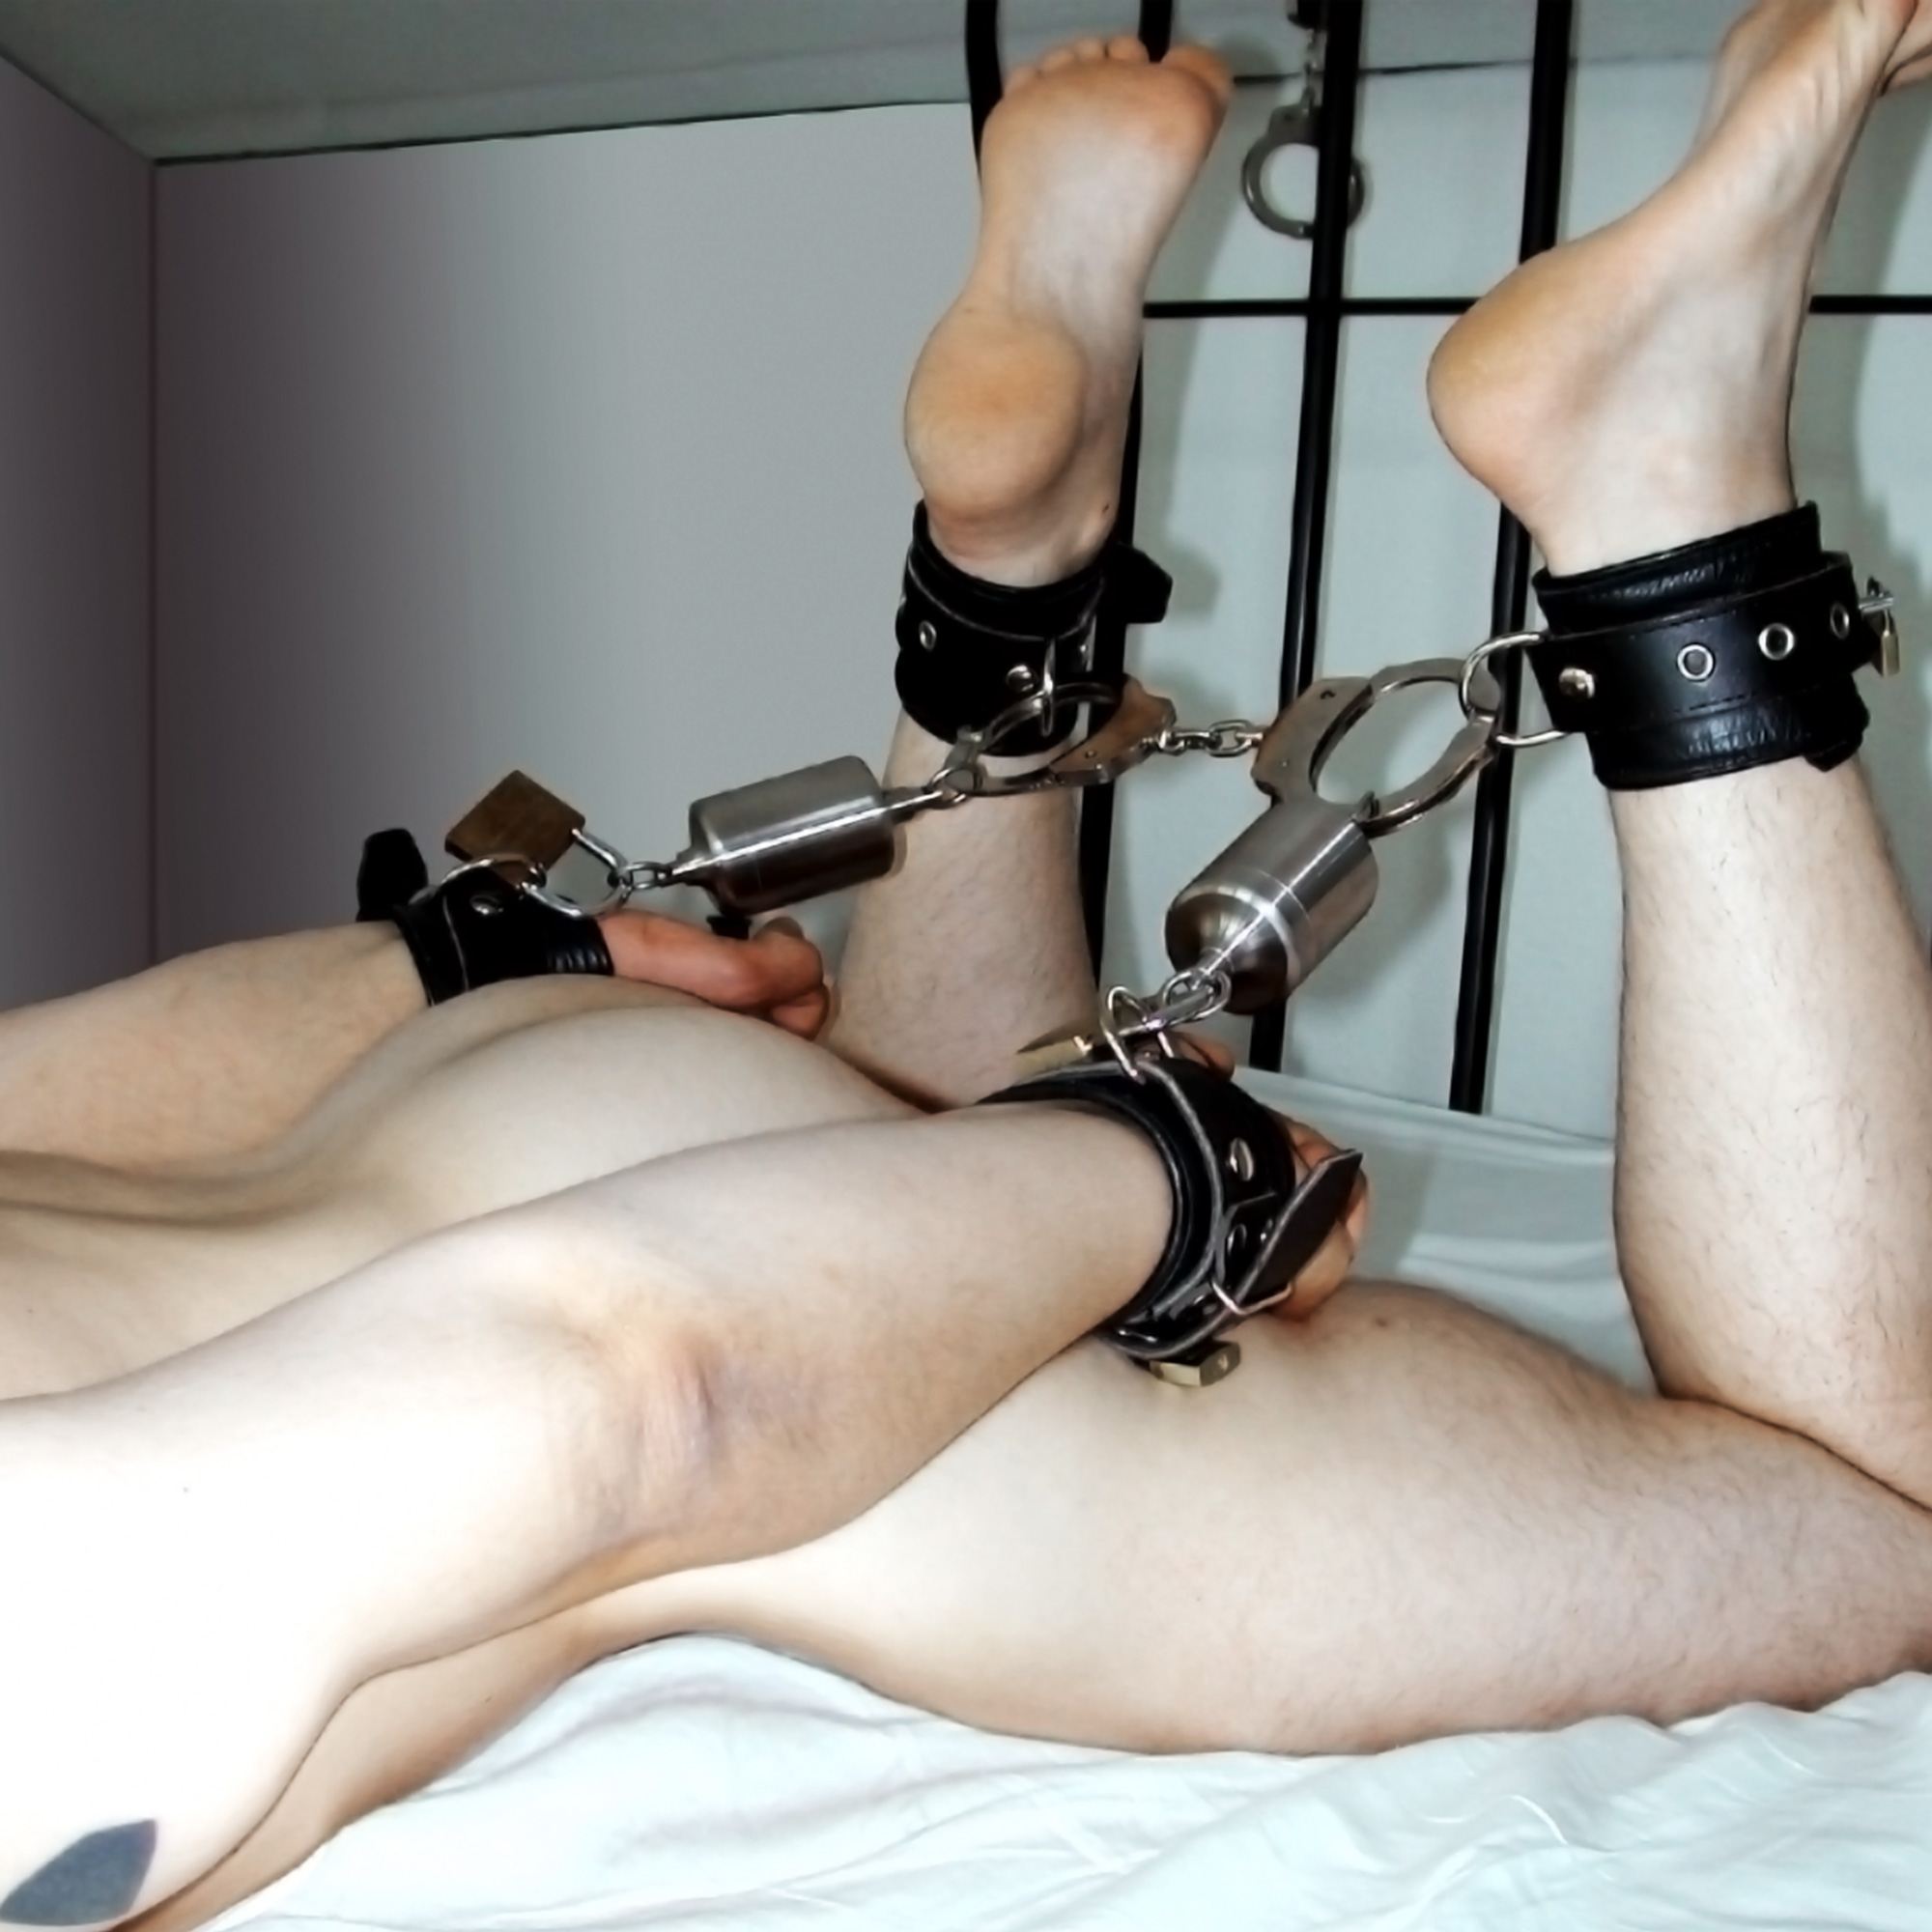 Latex Self Bondage Machine And Small Man